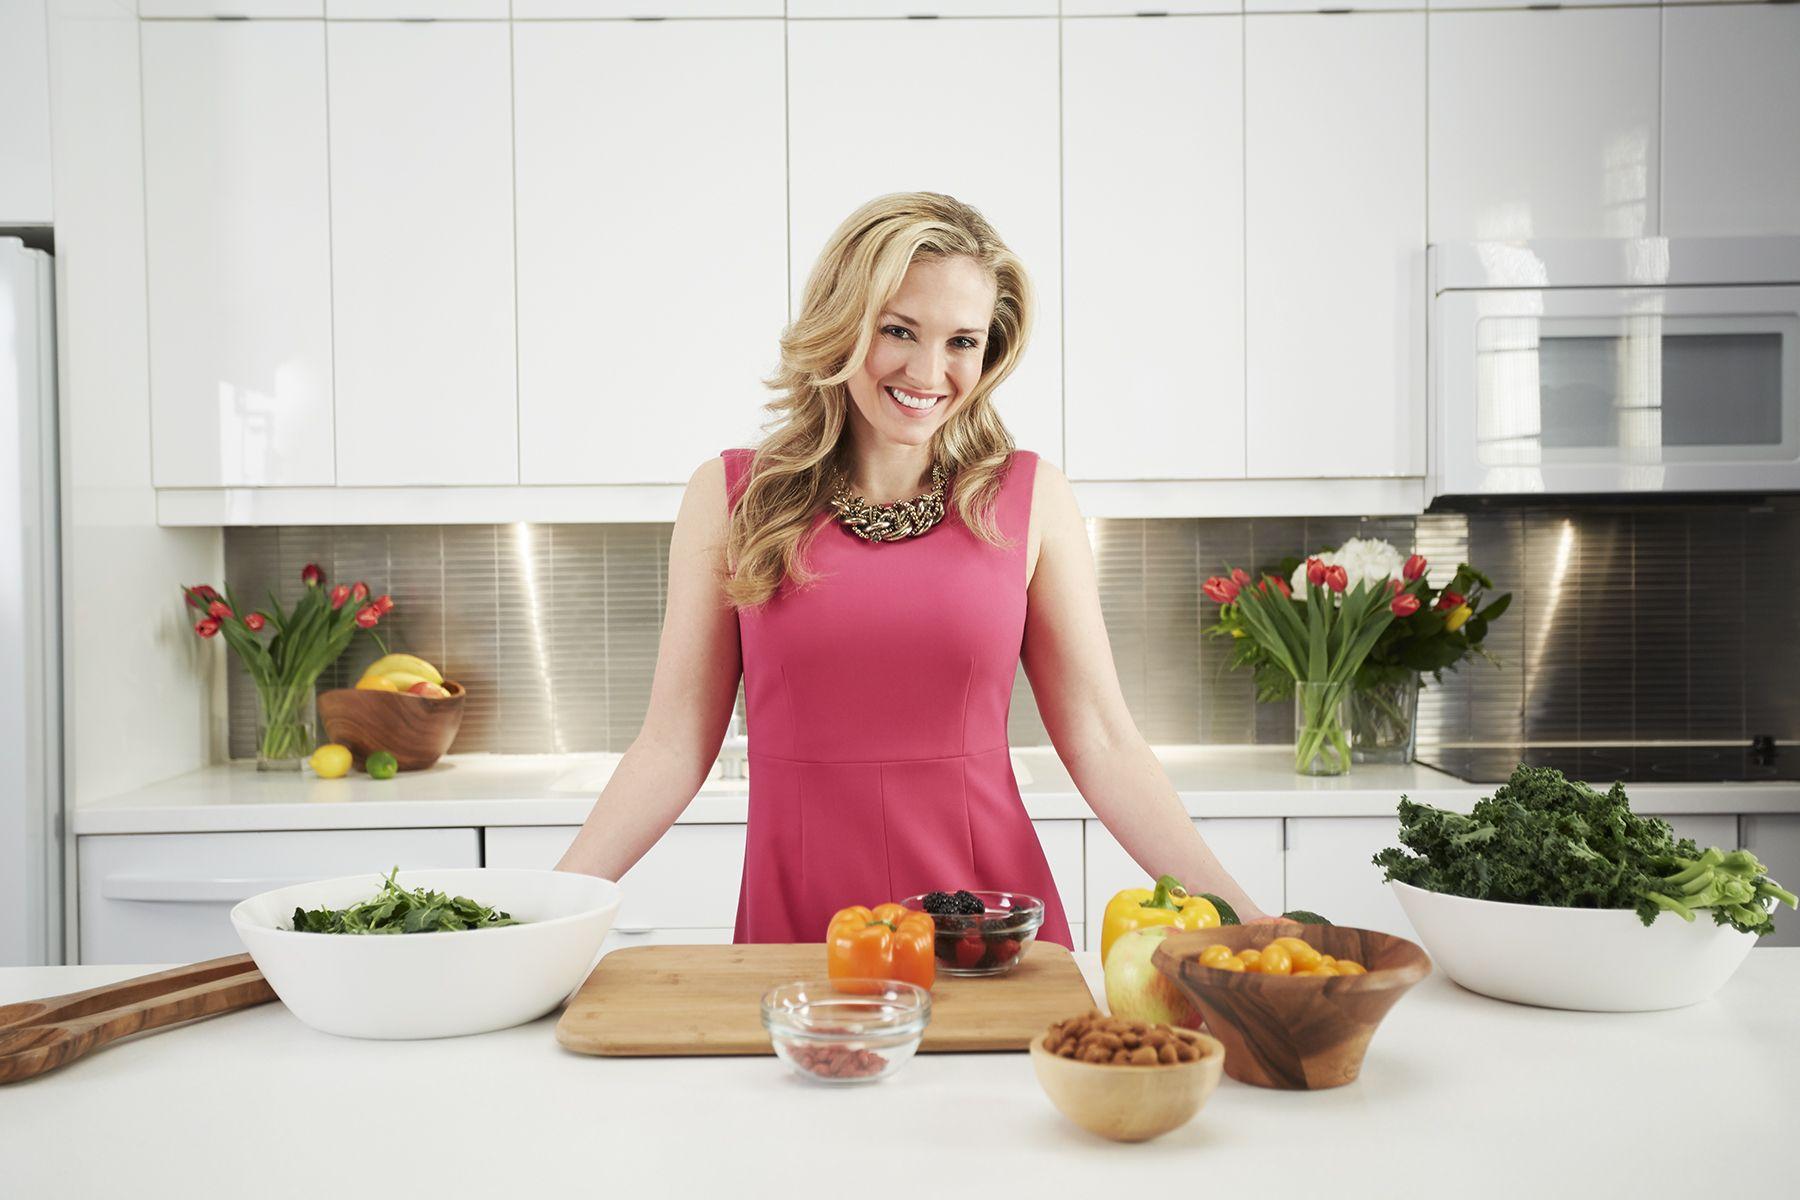 Award-winning Nutritionist and Author Ciara Foy